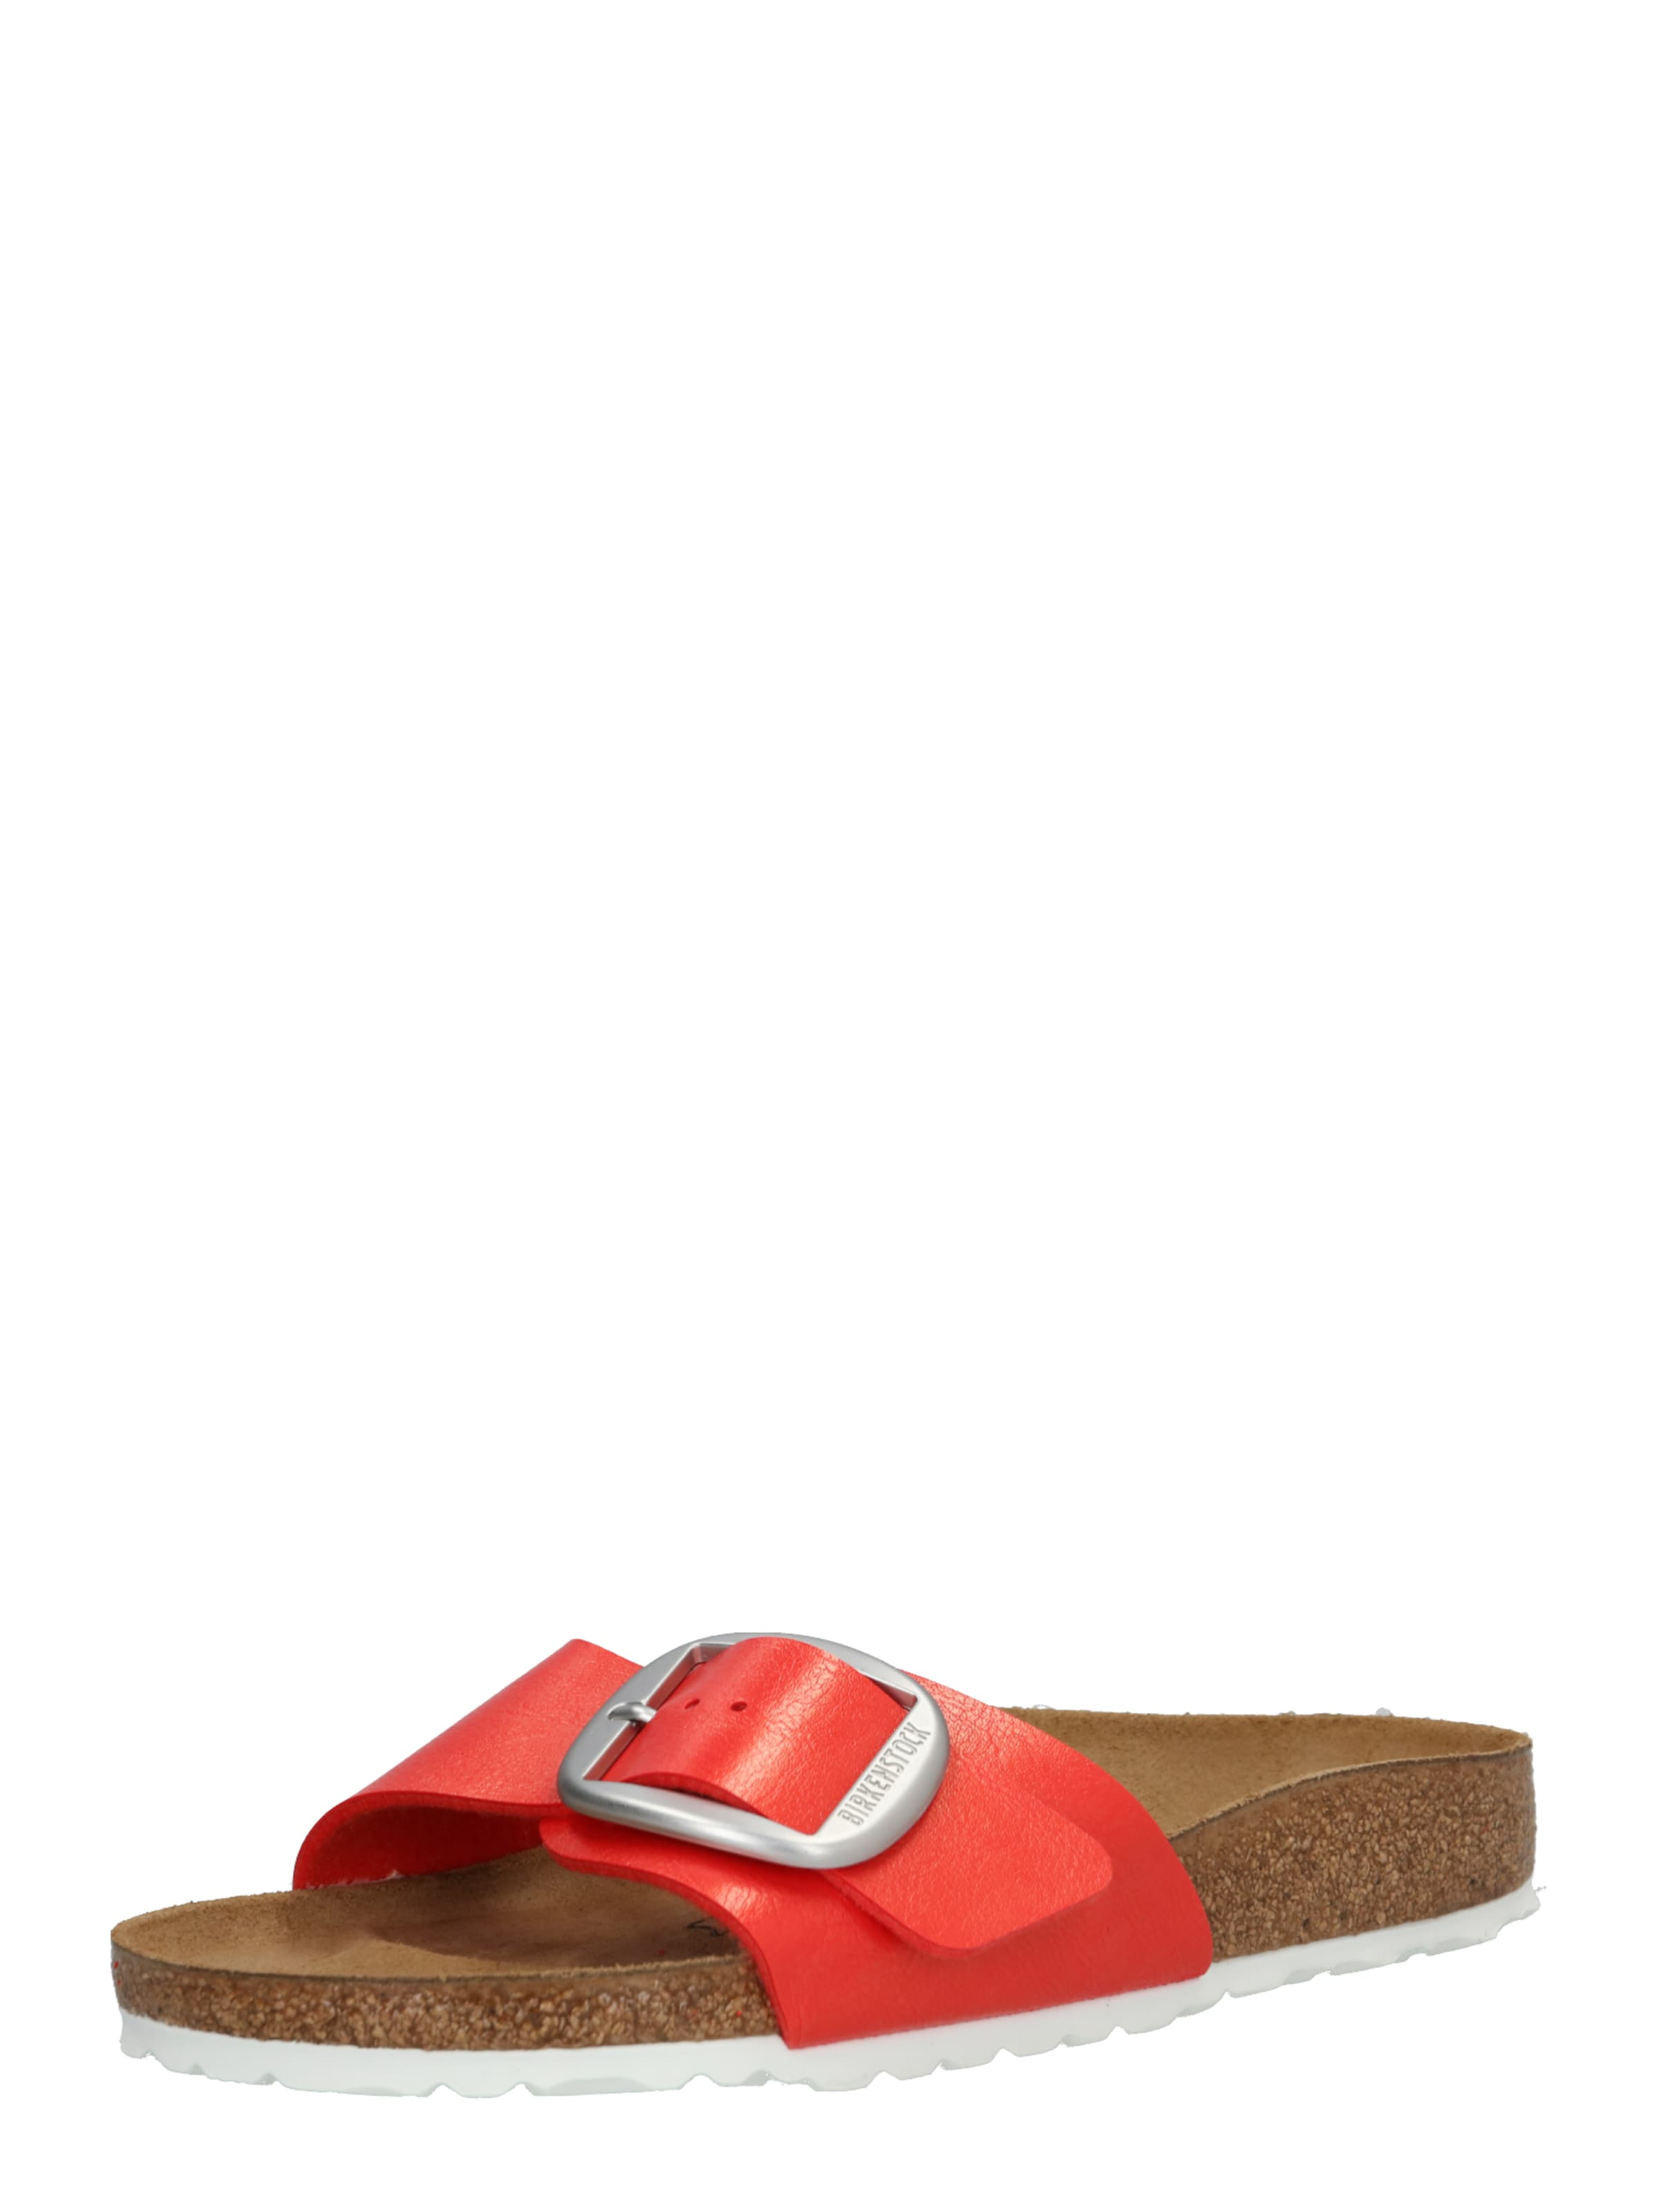 Pantolette Rot In 'madrid' Pantolette Birkenstock 'madrid' In Rot 'madrid' In Pantolette Birkenstock Birkenstock OZXPuTki